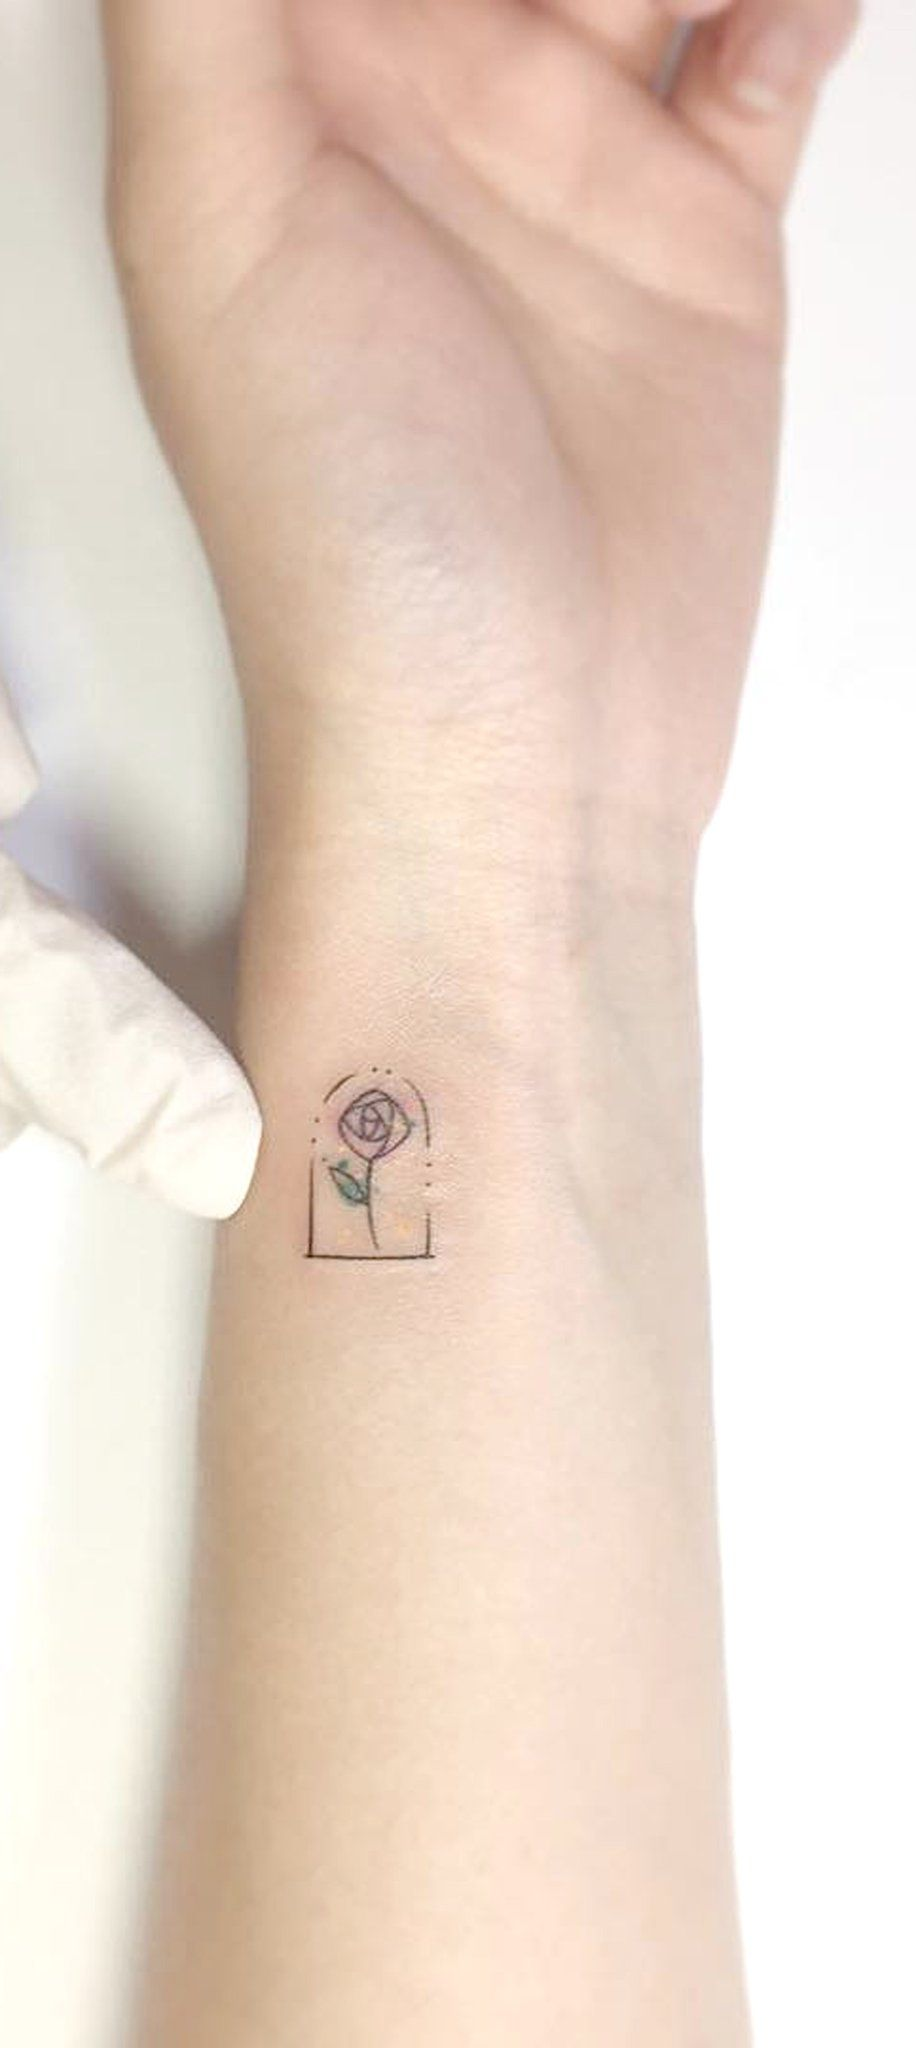 ac8190cf9 Small Flower Wrist Tattoo Ideas - Beauty and the Beast Disney Watercolor  Rose Arm Tatouage - www.MyBodiArt.com